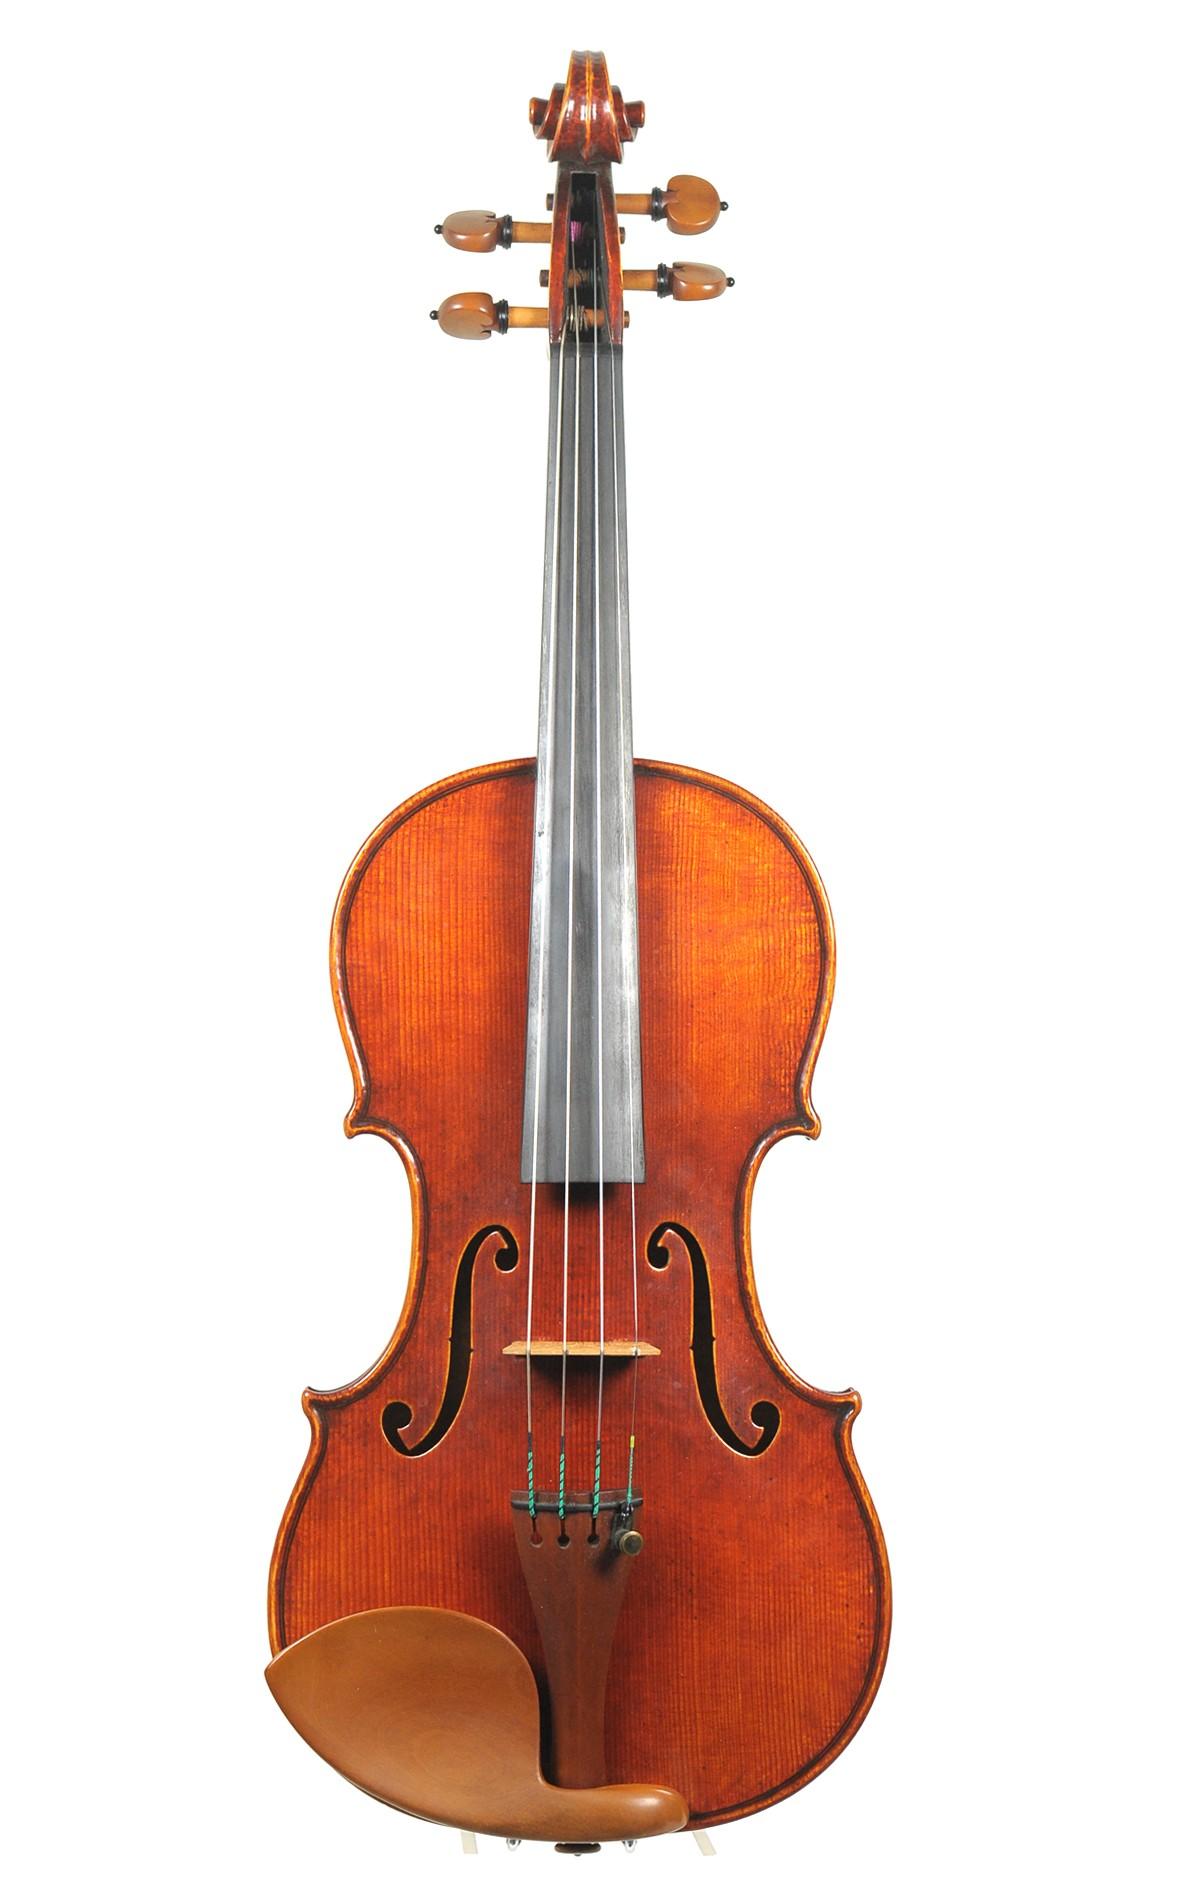 Contemporary English master violin, after Guarneri, Victor Unsworth - top